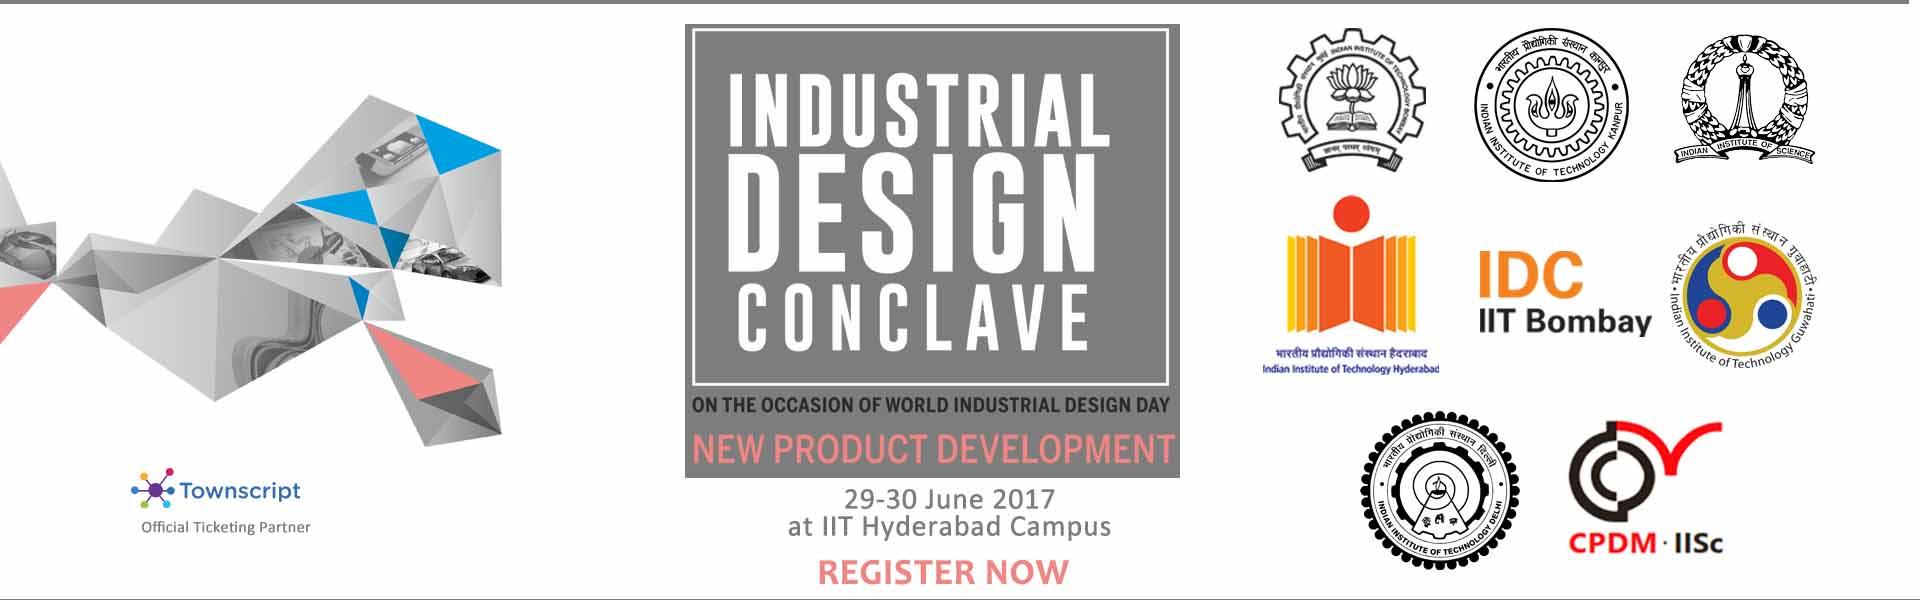 industrial-design-conclave-2017